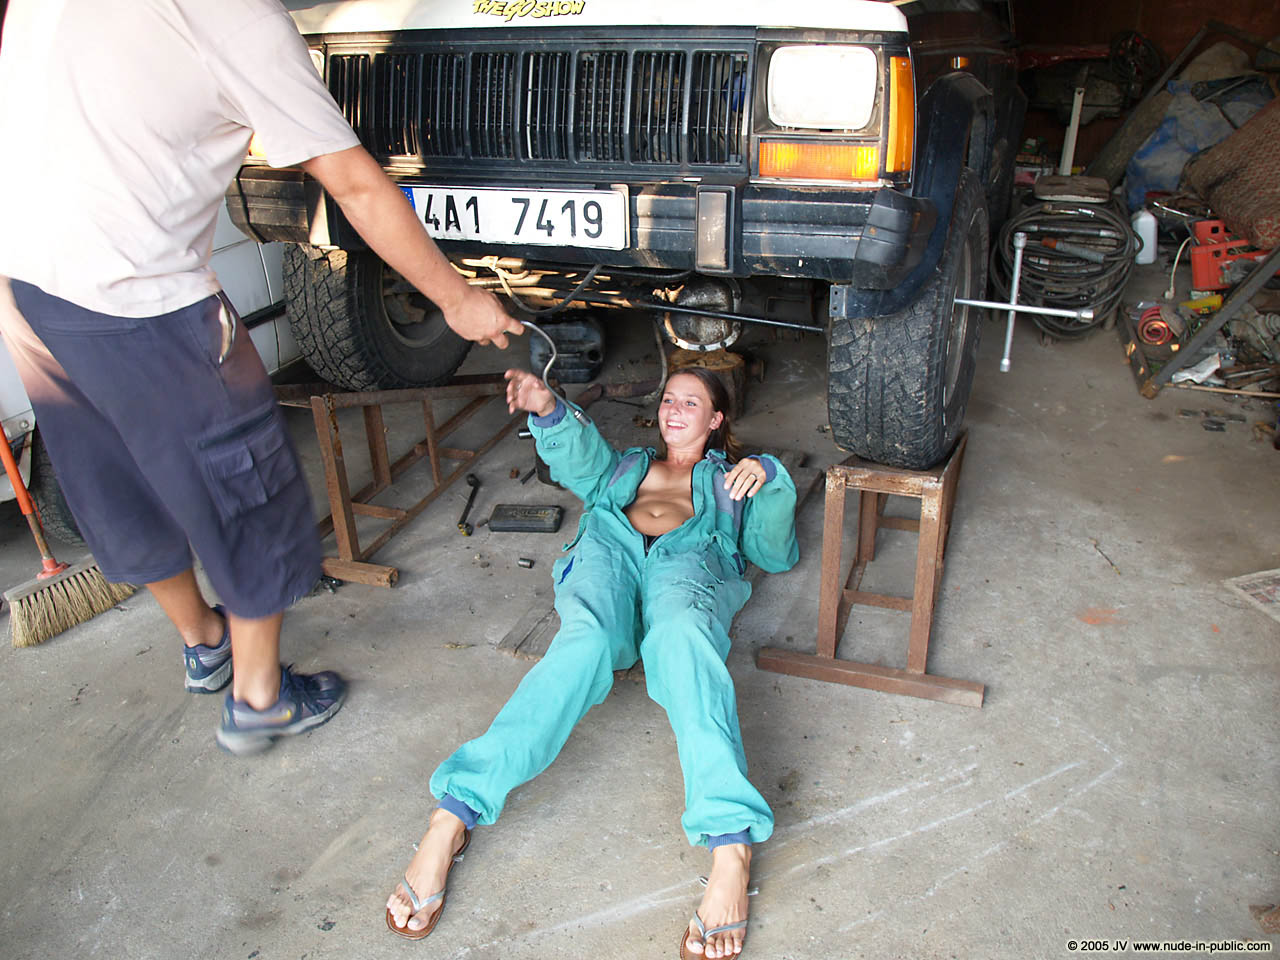 veronika-e-junkyard-cars-mechanic-nude-in-public-03